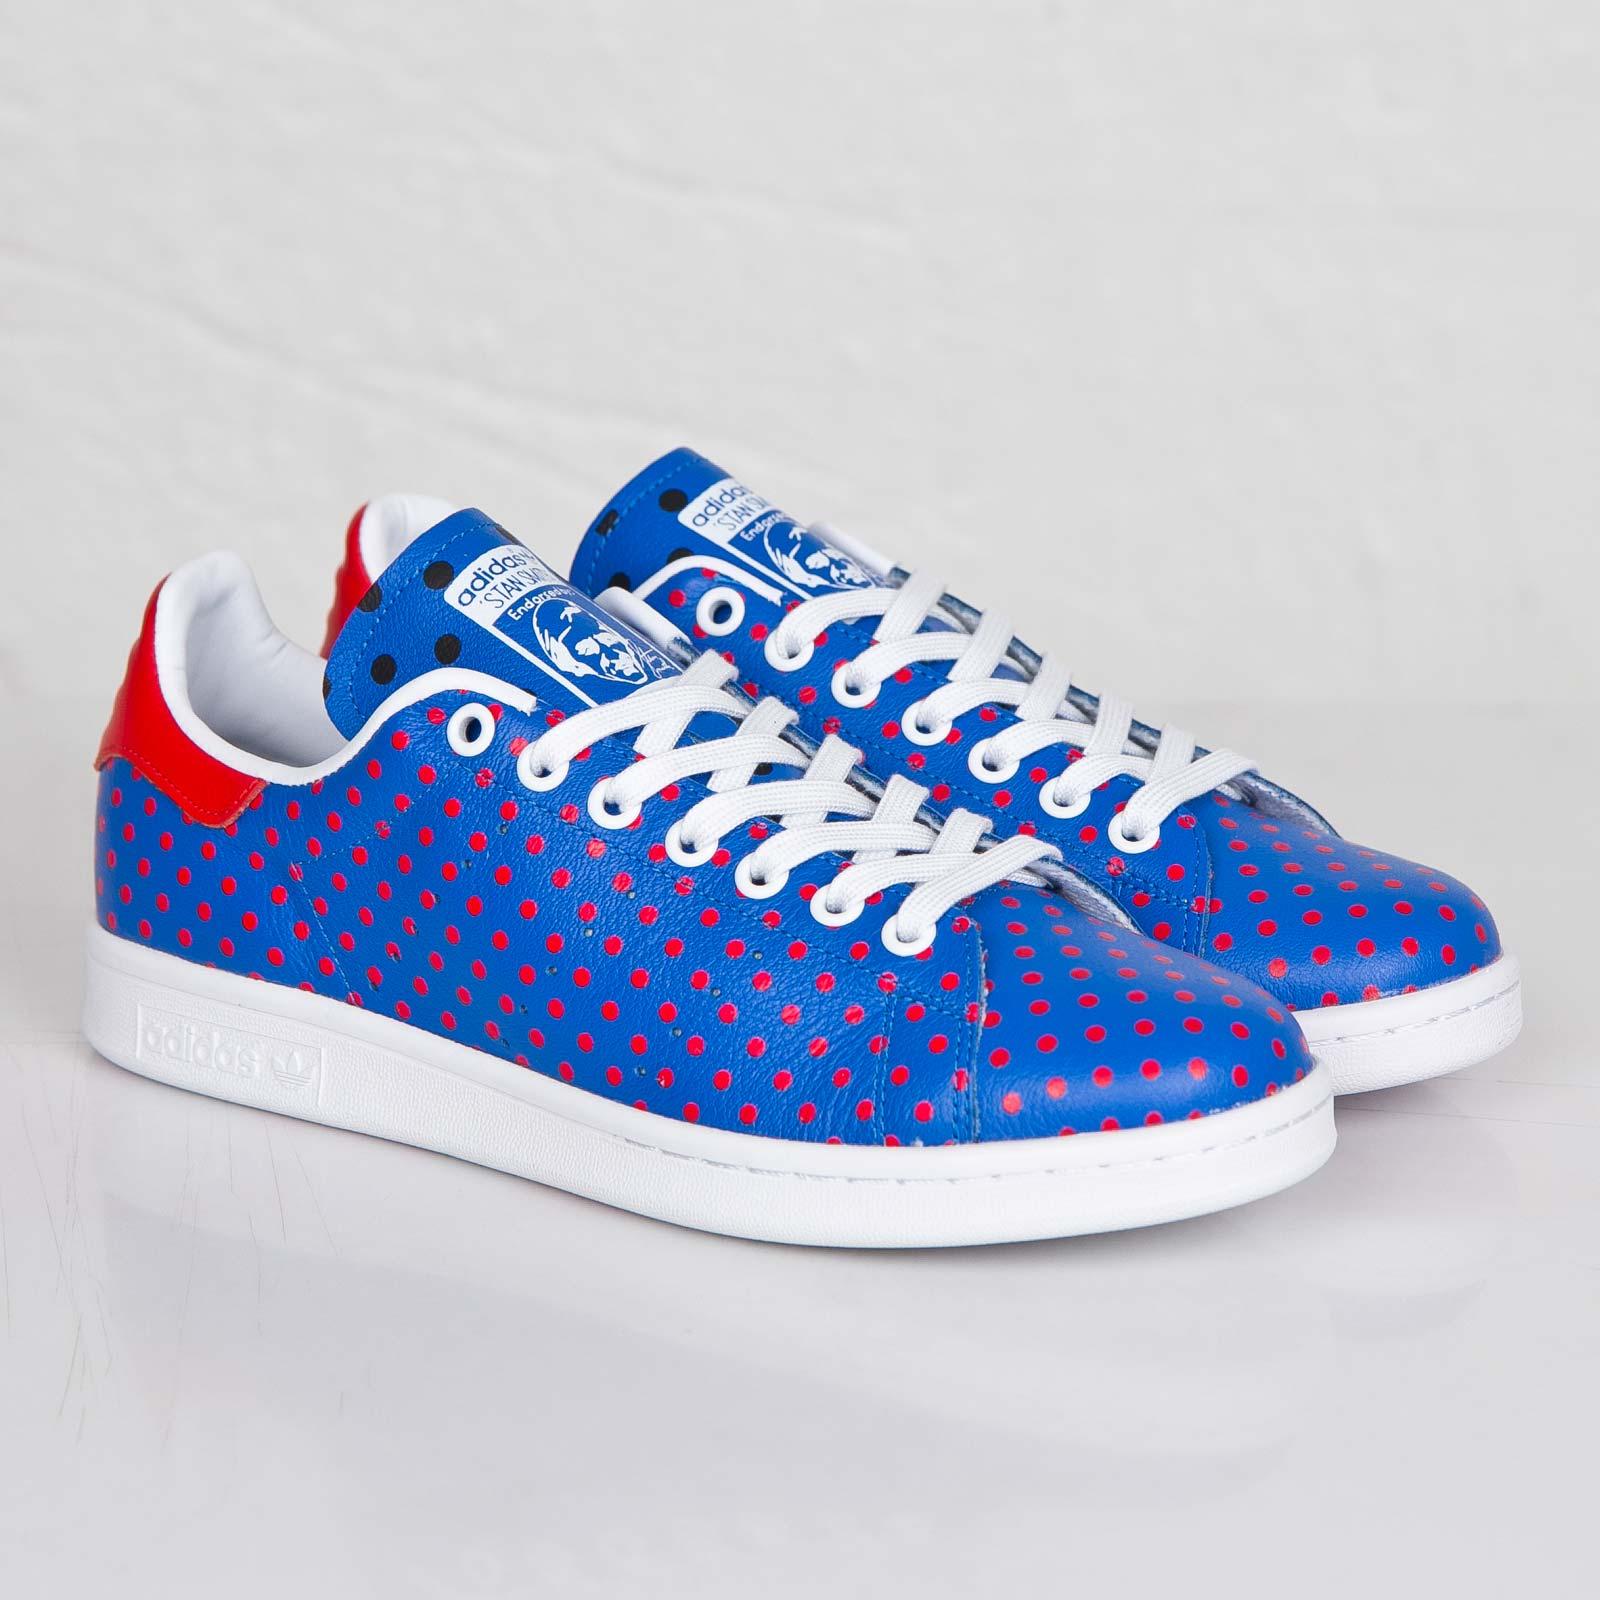 Adidas pw stan smith docup b25400 scarpe da ginnasticanstuff scarpe